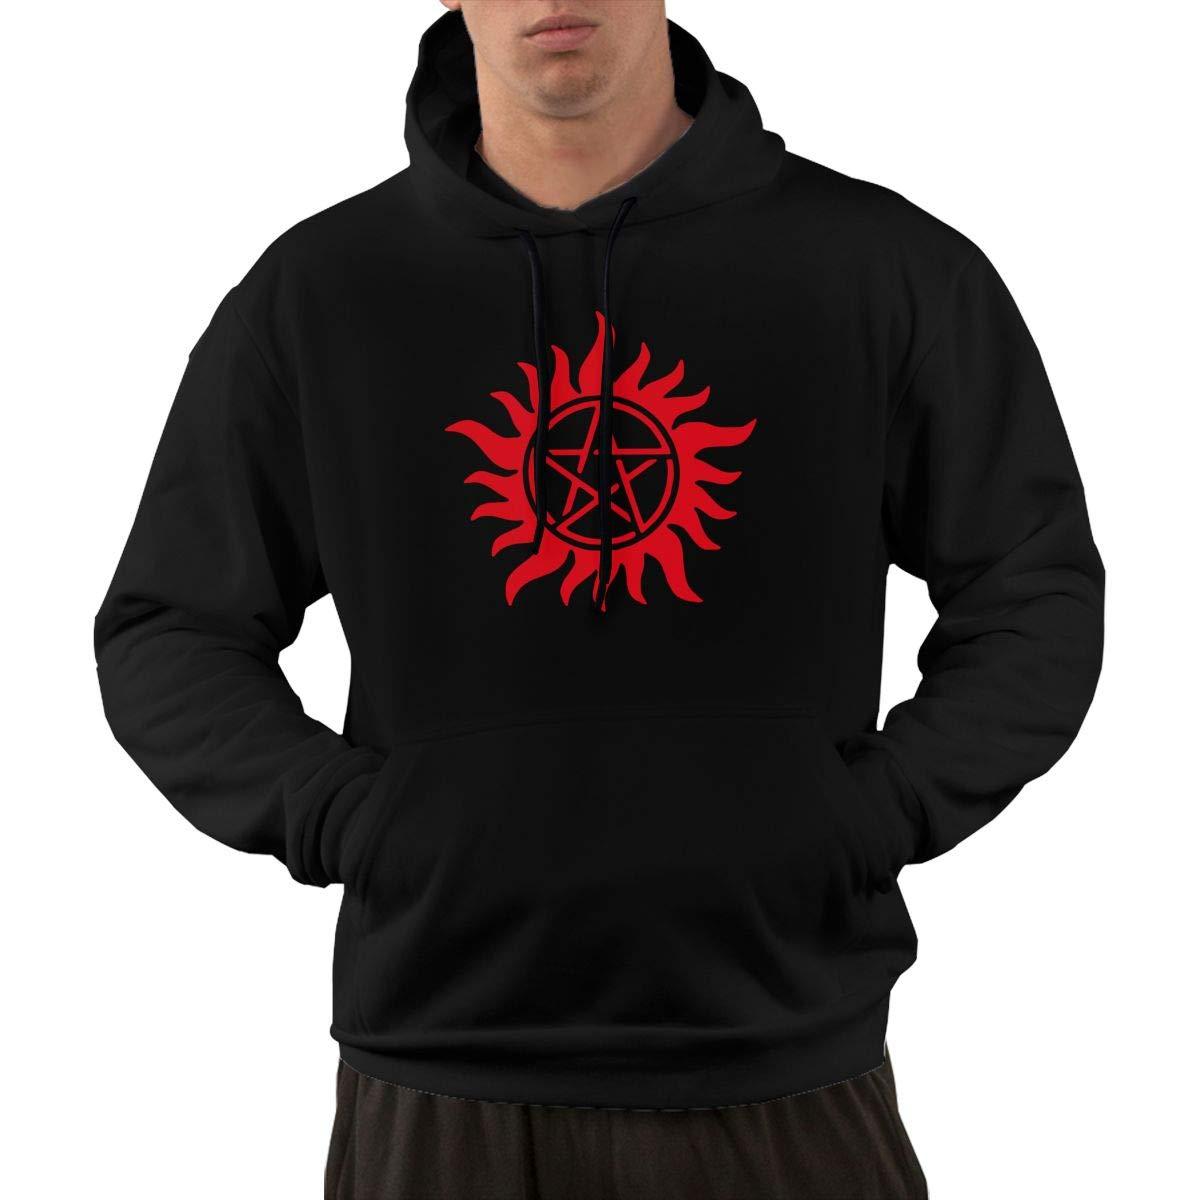 Supernatural Anti Possession Symbol 3 Mens Hooded Sweater NewCoat with Kanga Pocket Black